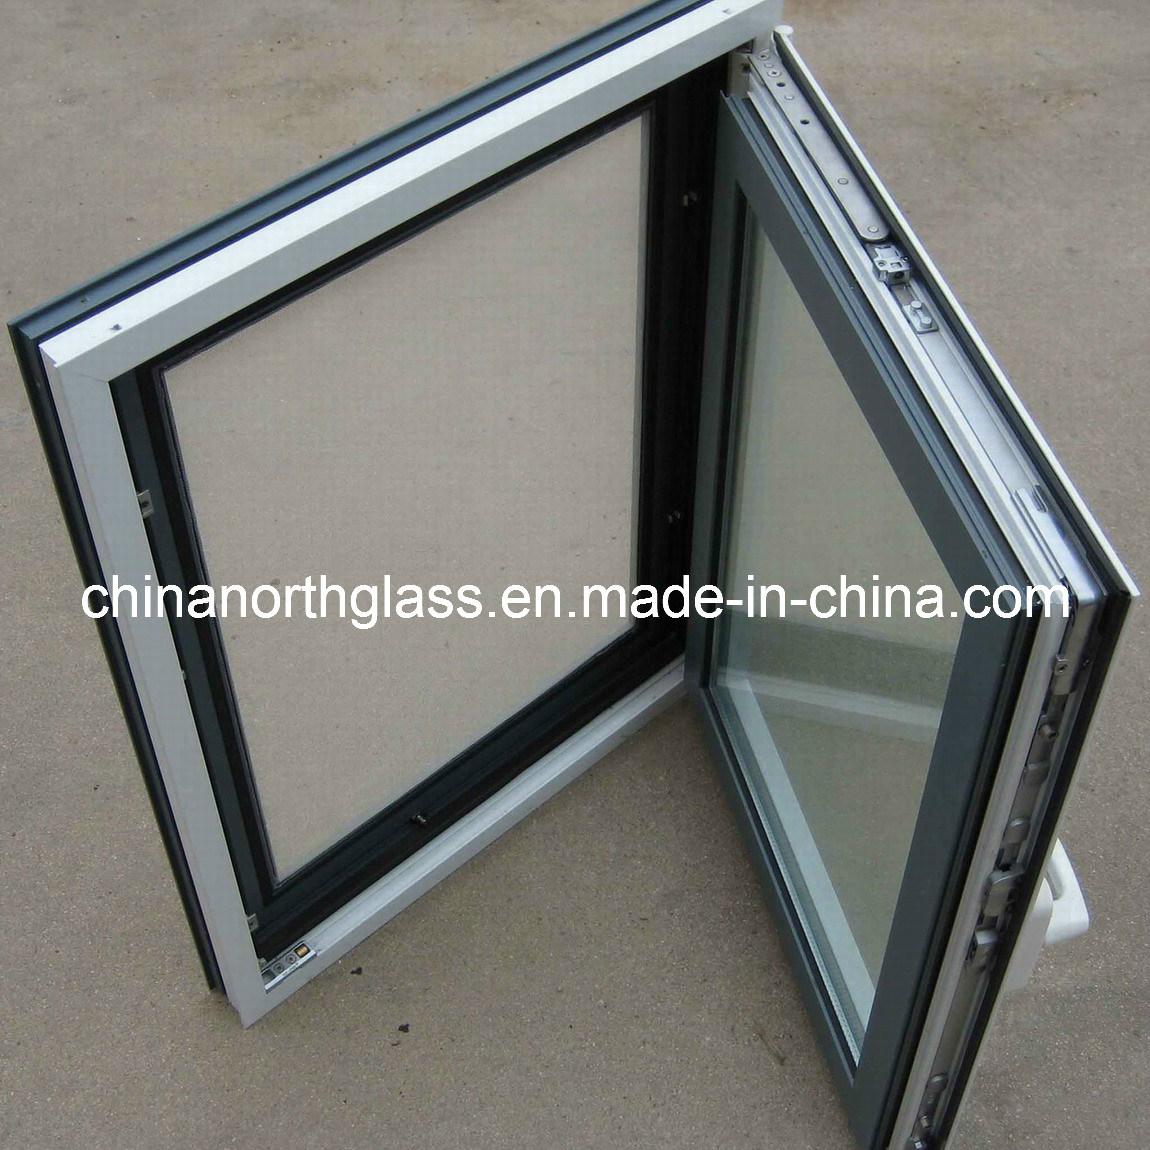 #404C60 Fotos De Janela Aluminio E Madeira Forro Pvc Curitiba Pictures to pin  648 Janelas Pvc E Madeira